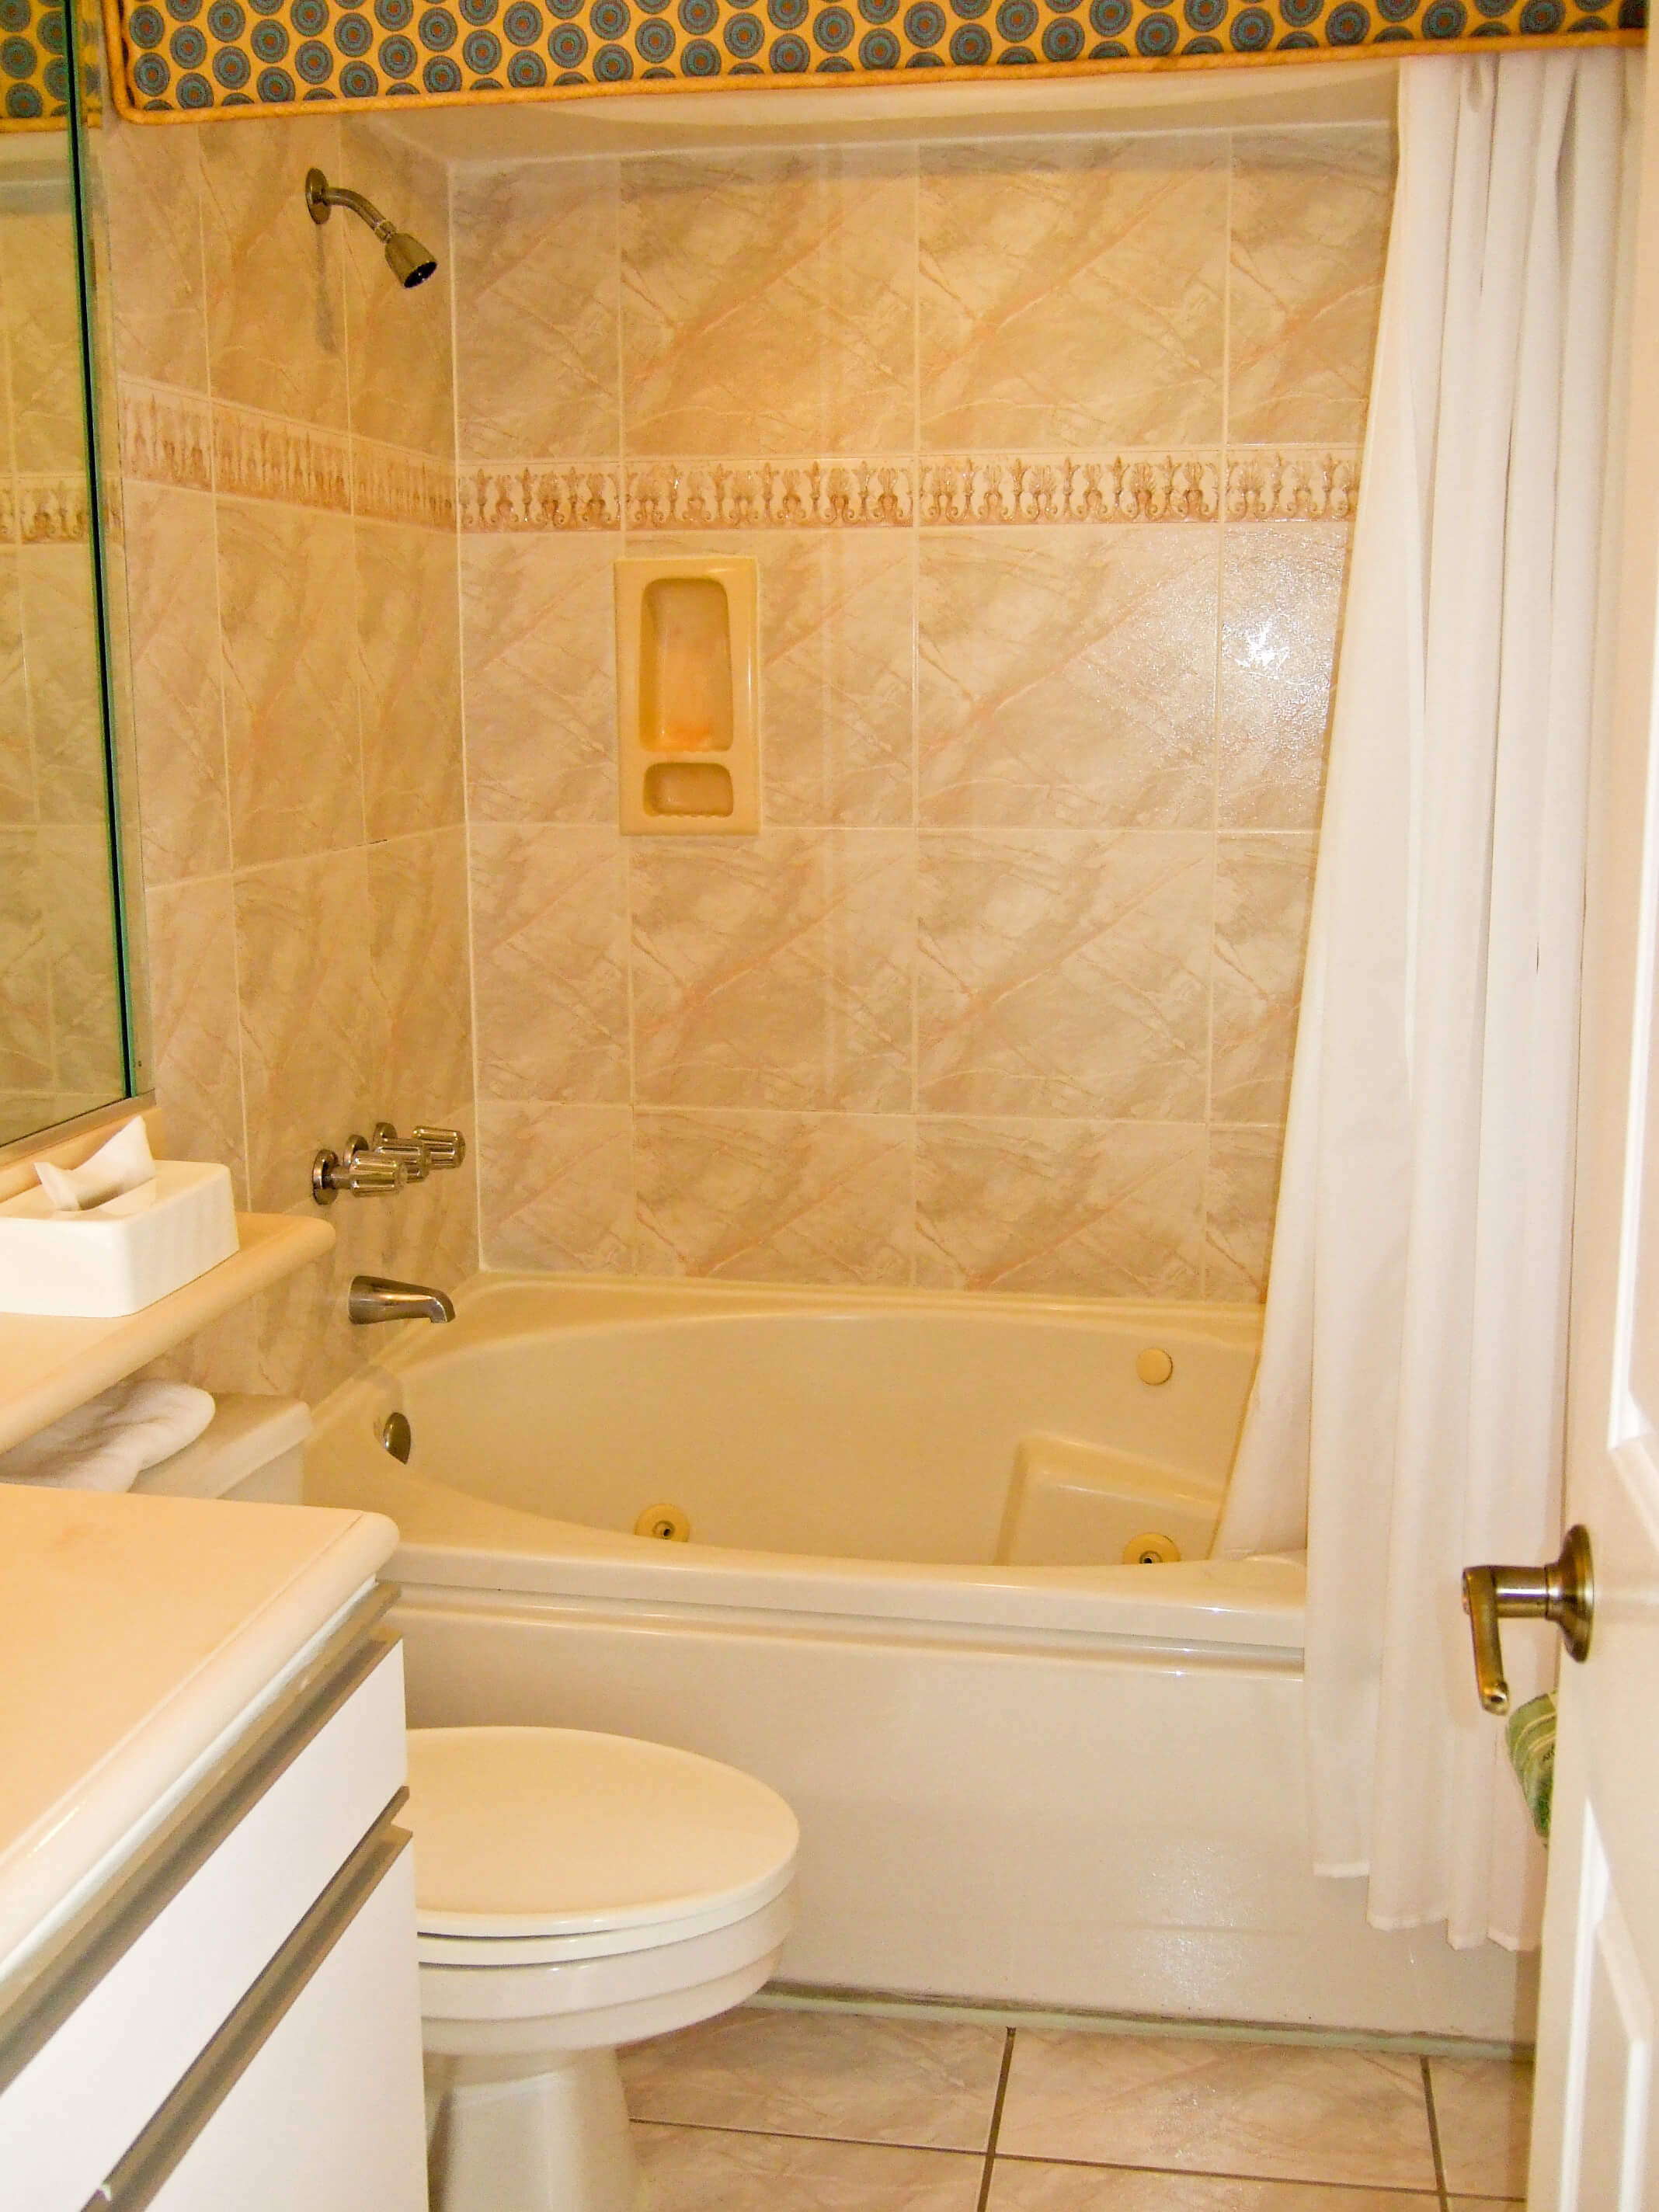 Bathtub at our Daytona Beach resorts | Harbour Beach Resort | Westgate Resorts